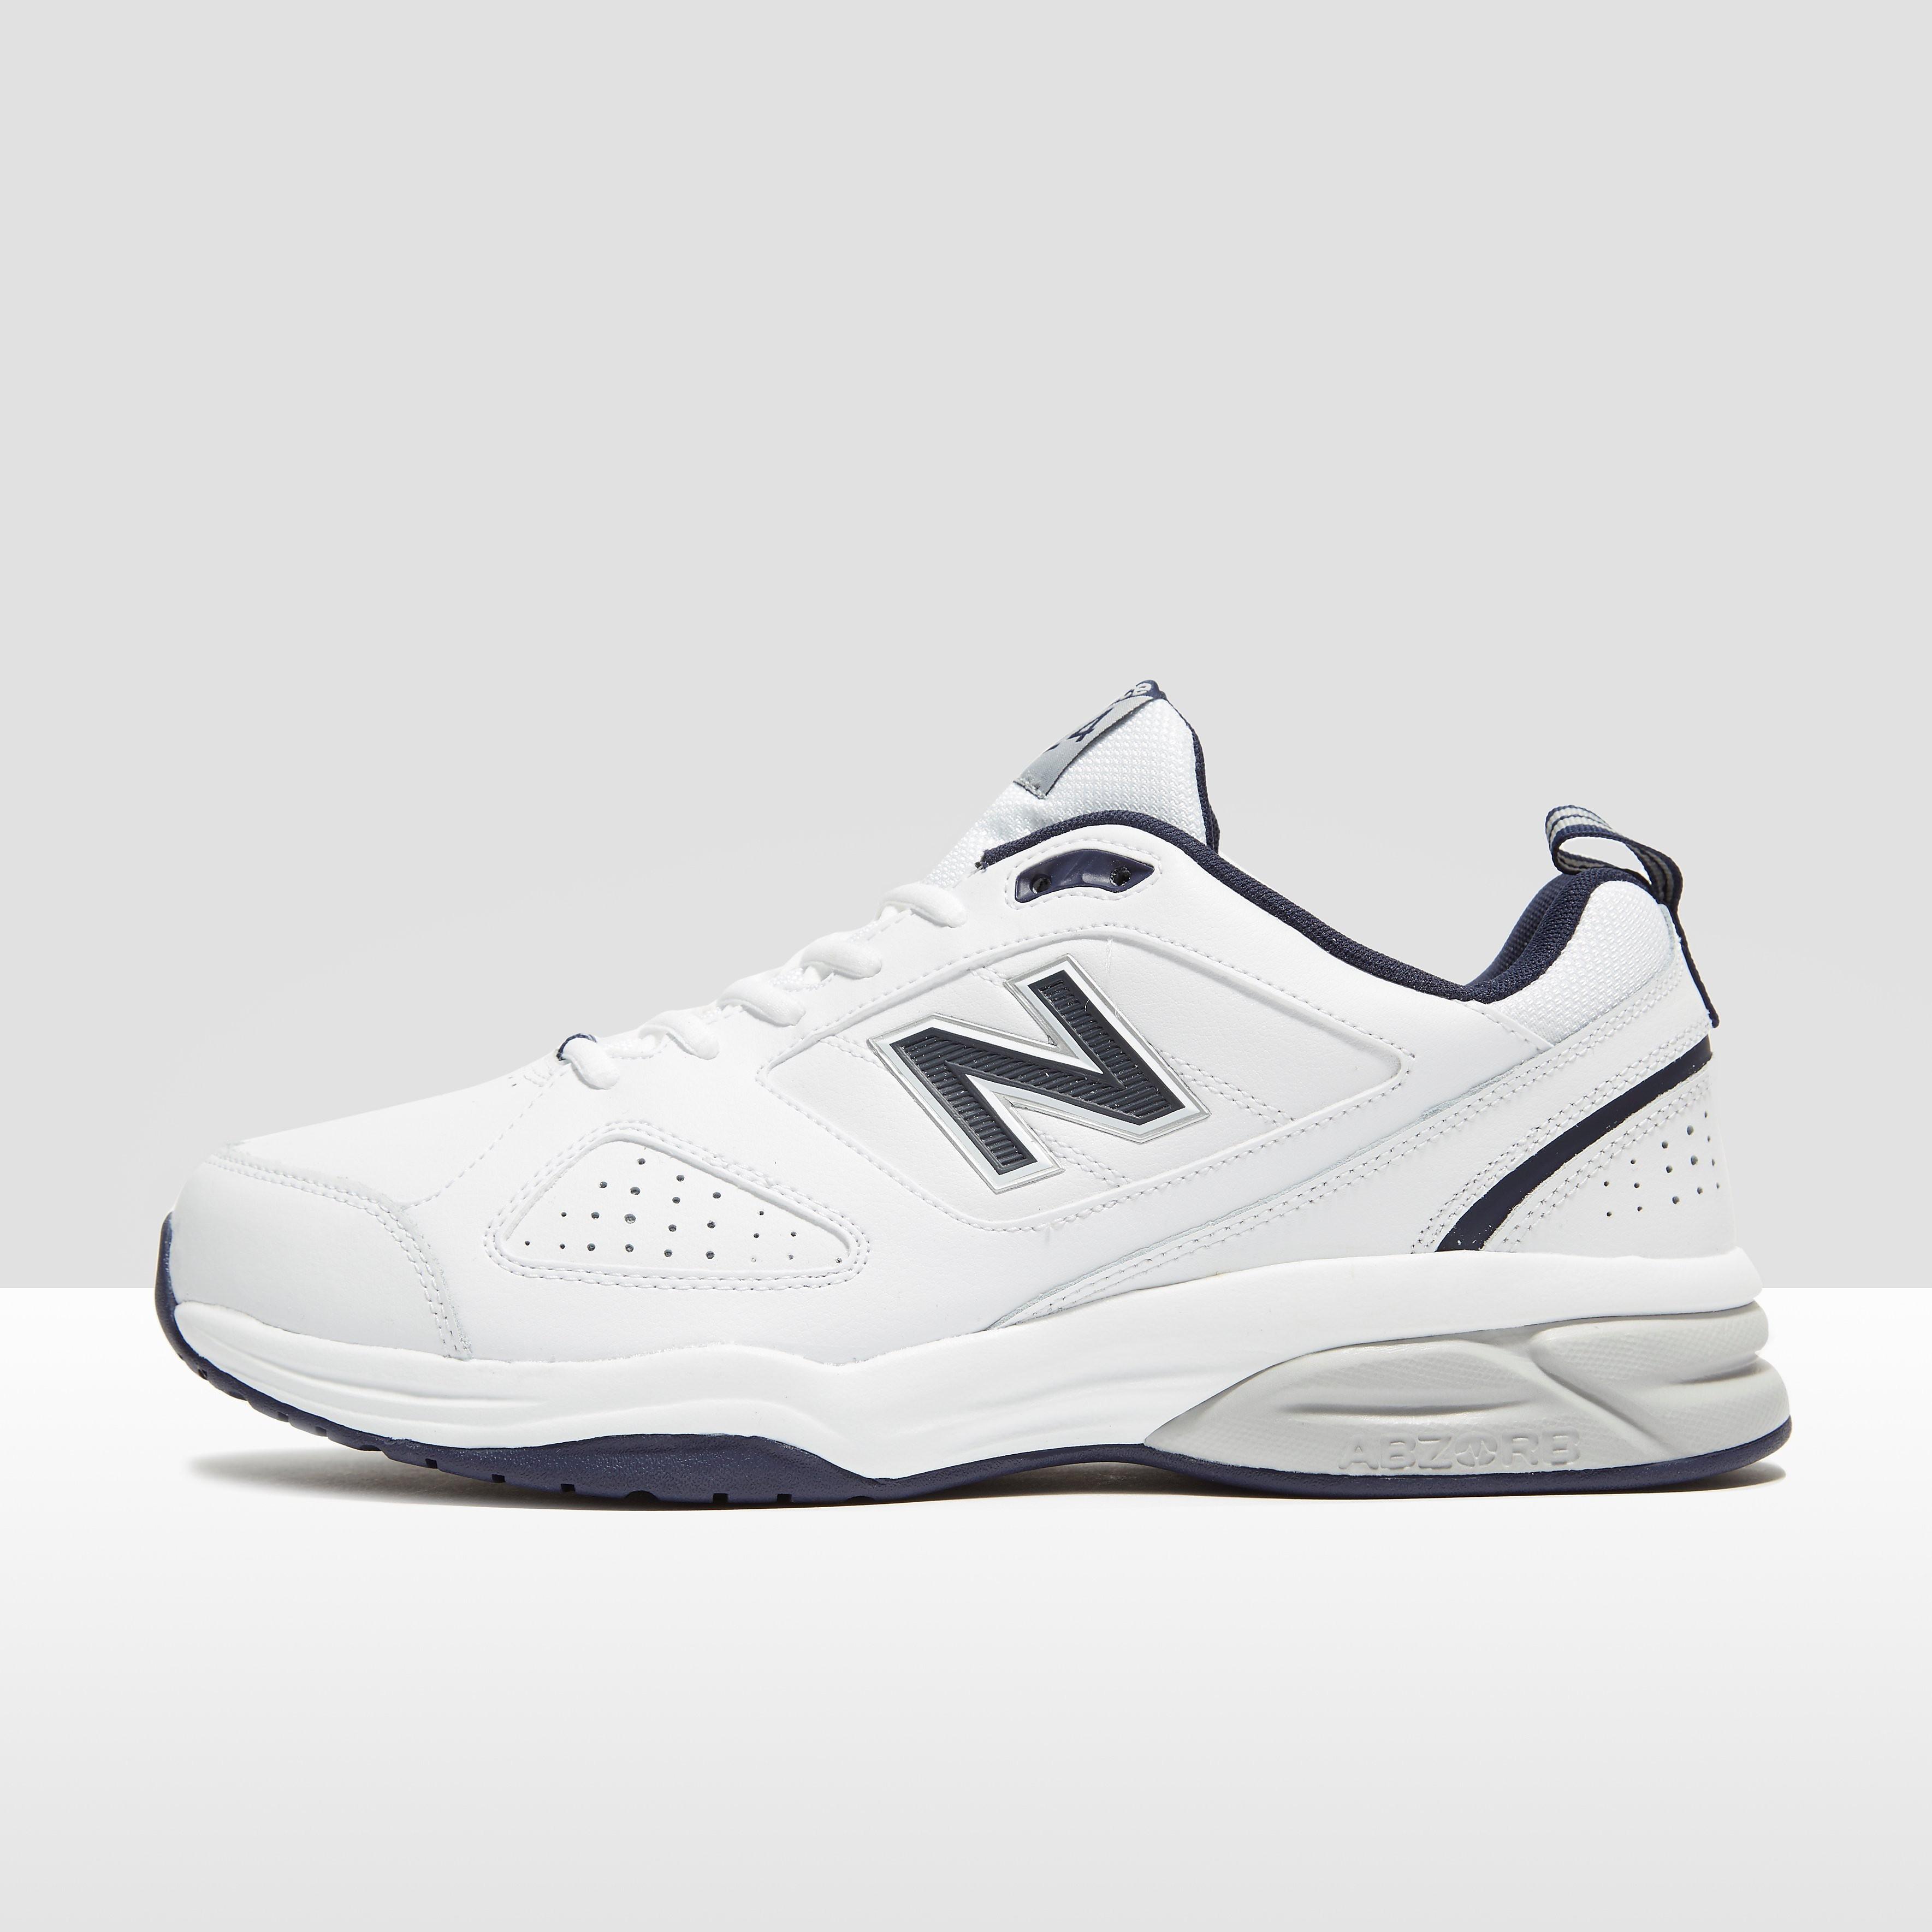 New Balance 624v4 Men's Training Shoes